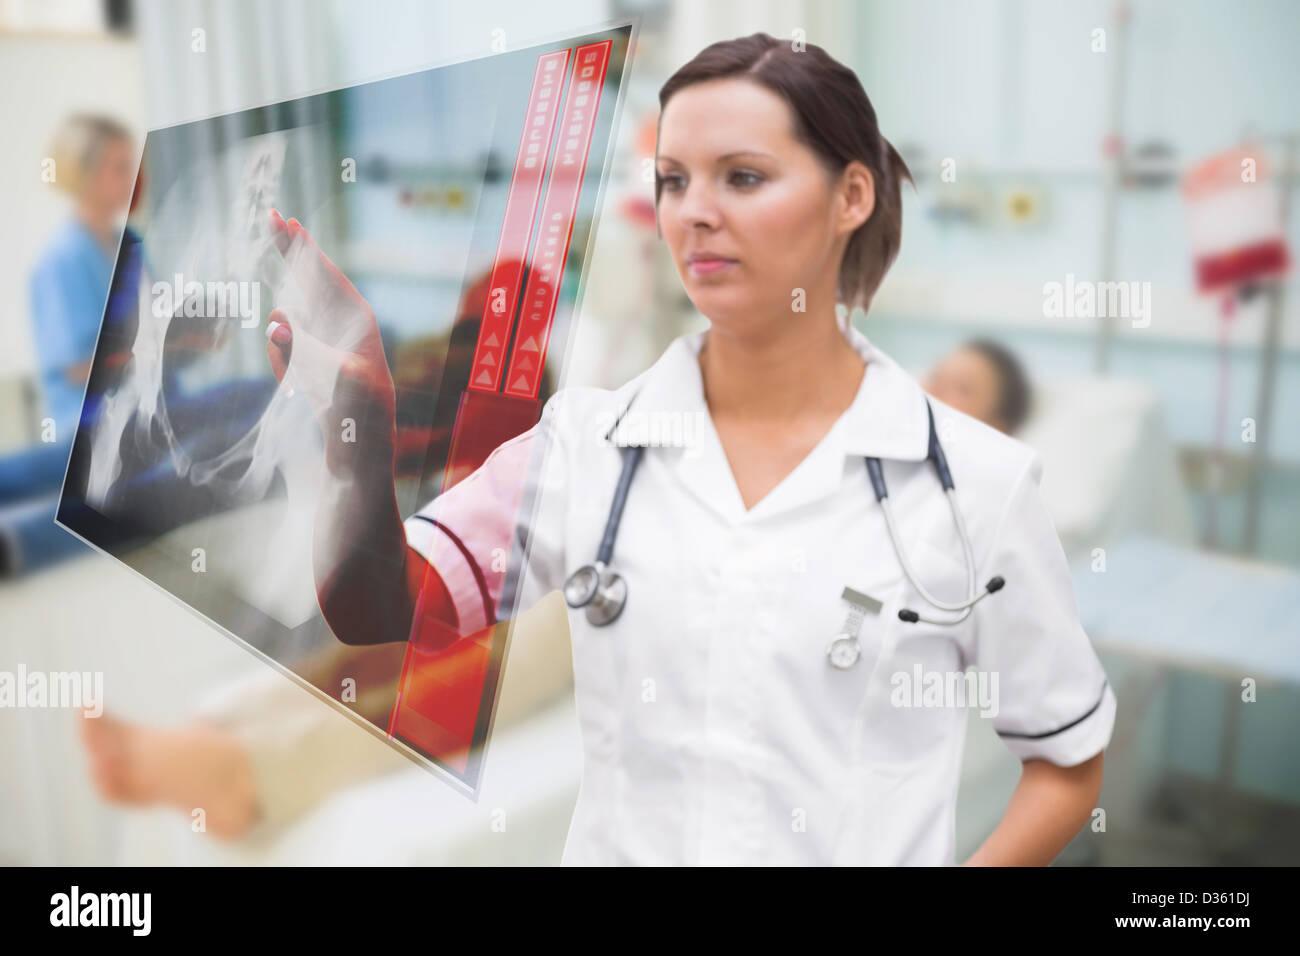 Nurse pressing on screen showing pelvic x-ray - Stock Image